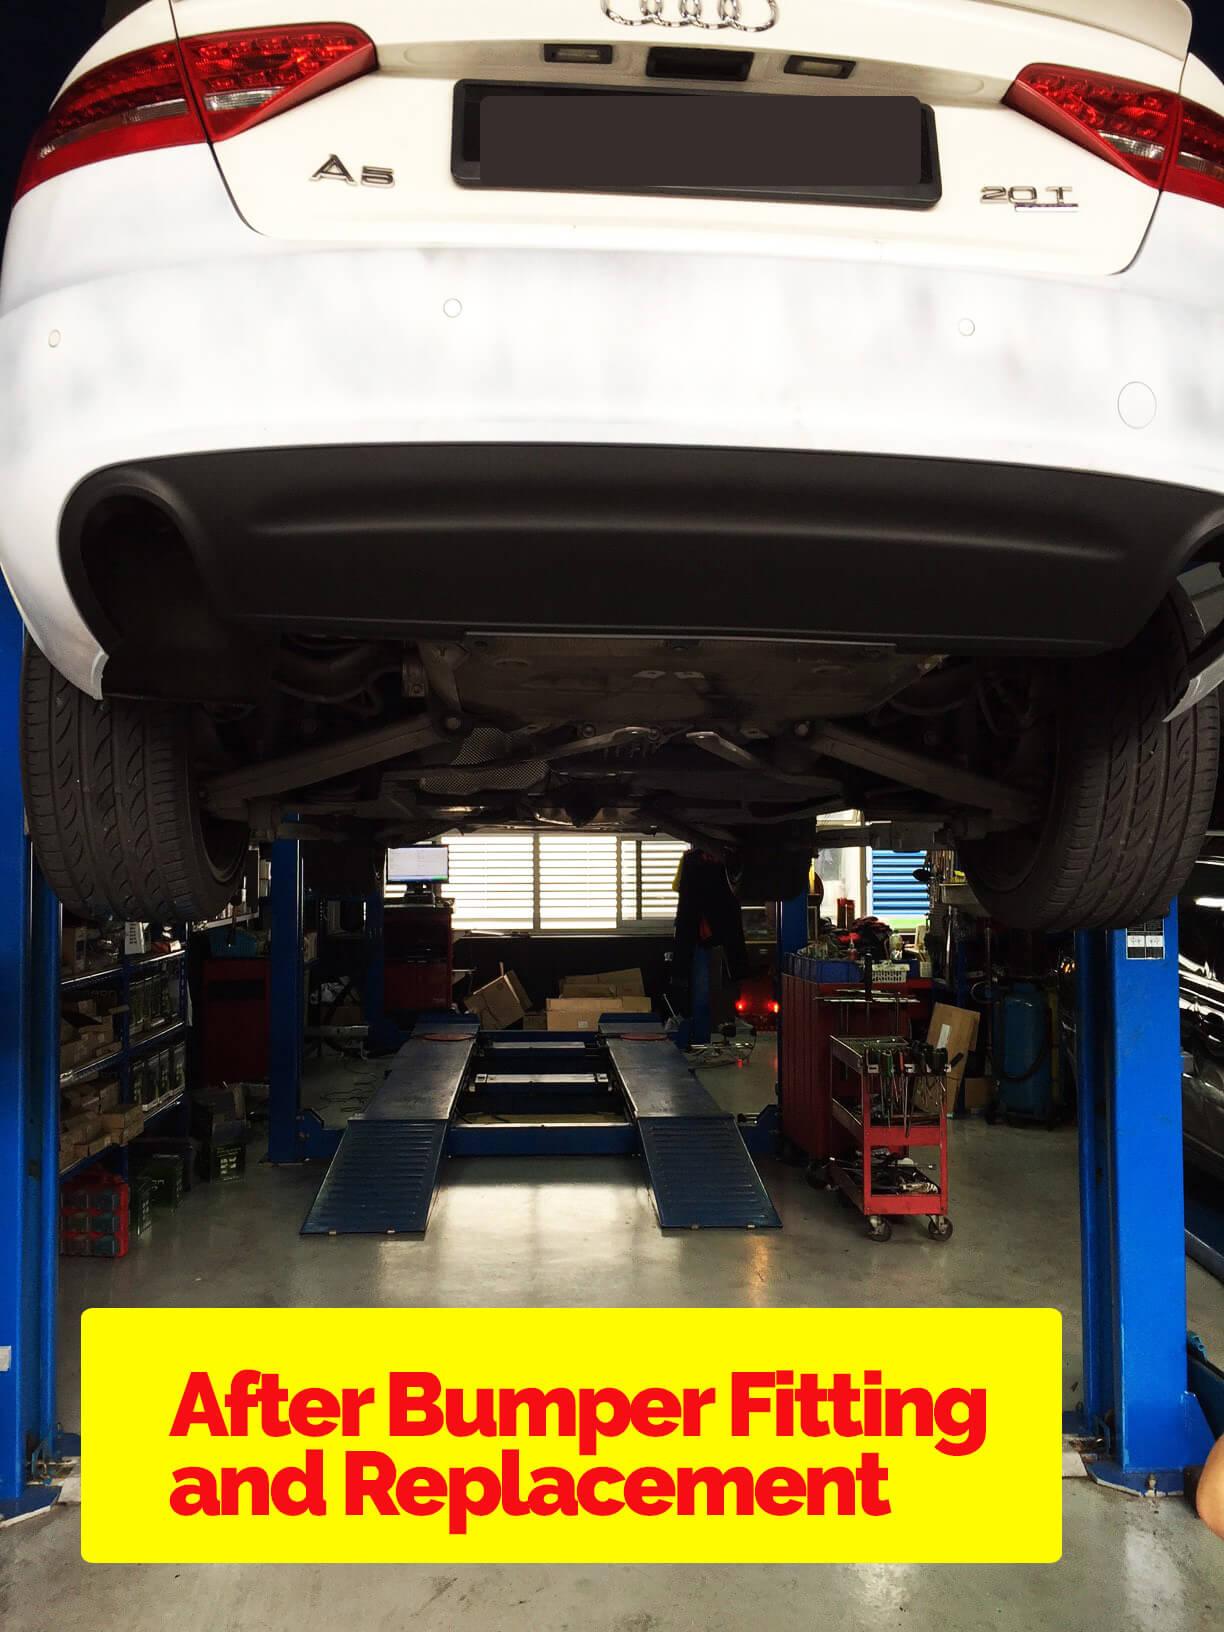 Audi A5 Accident Repair - Bumper Replacement